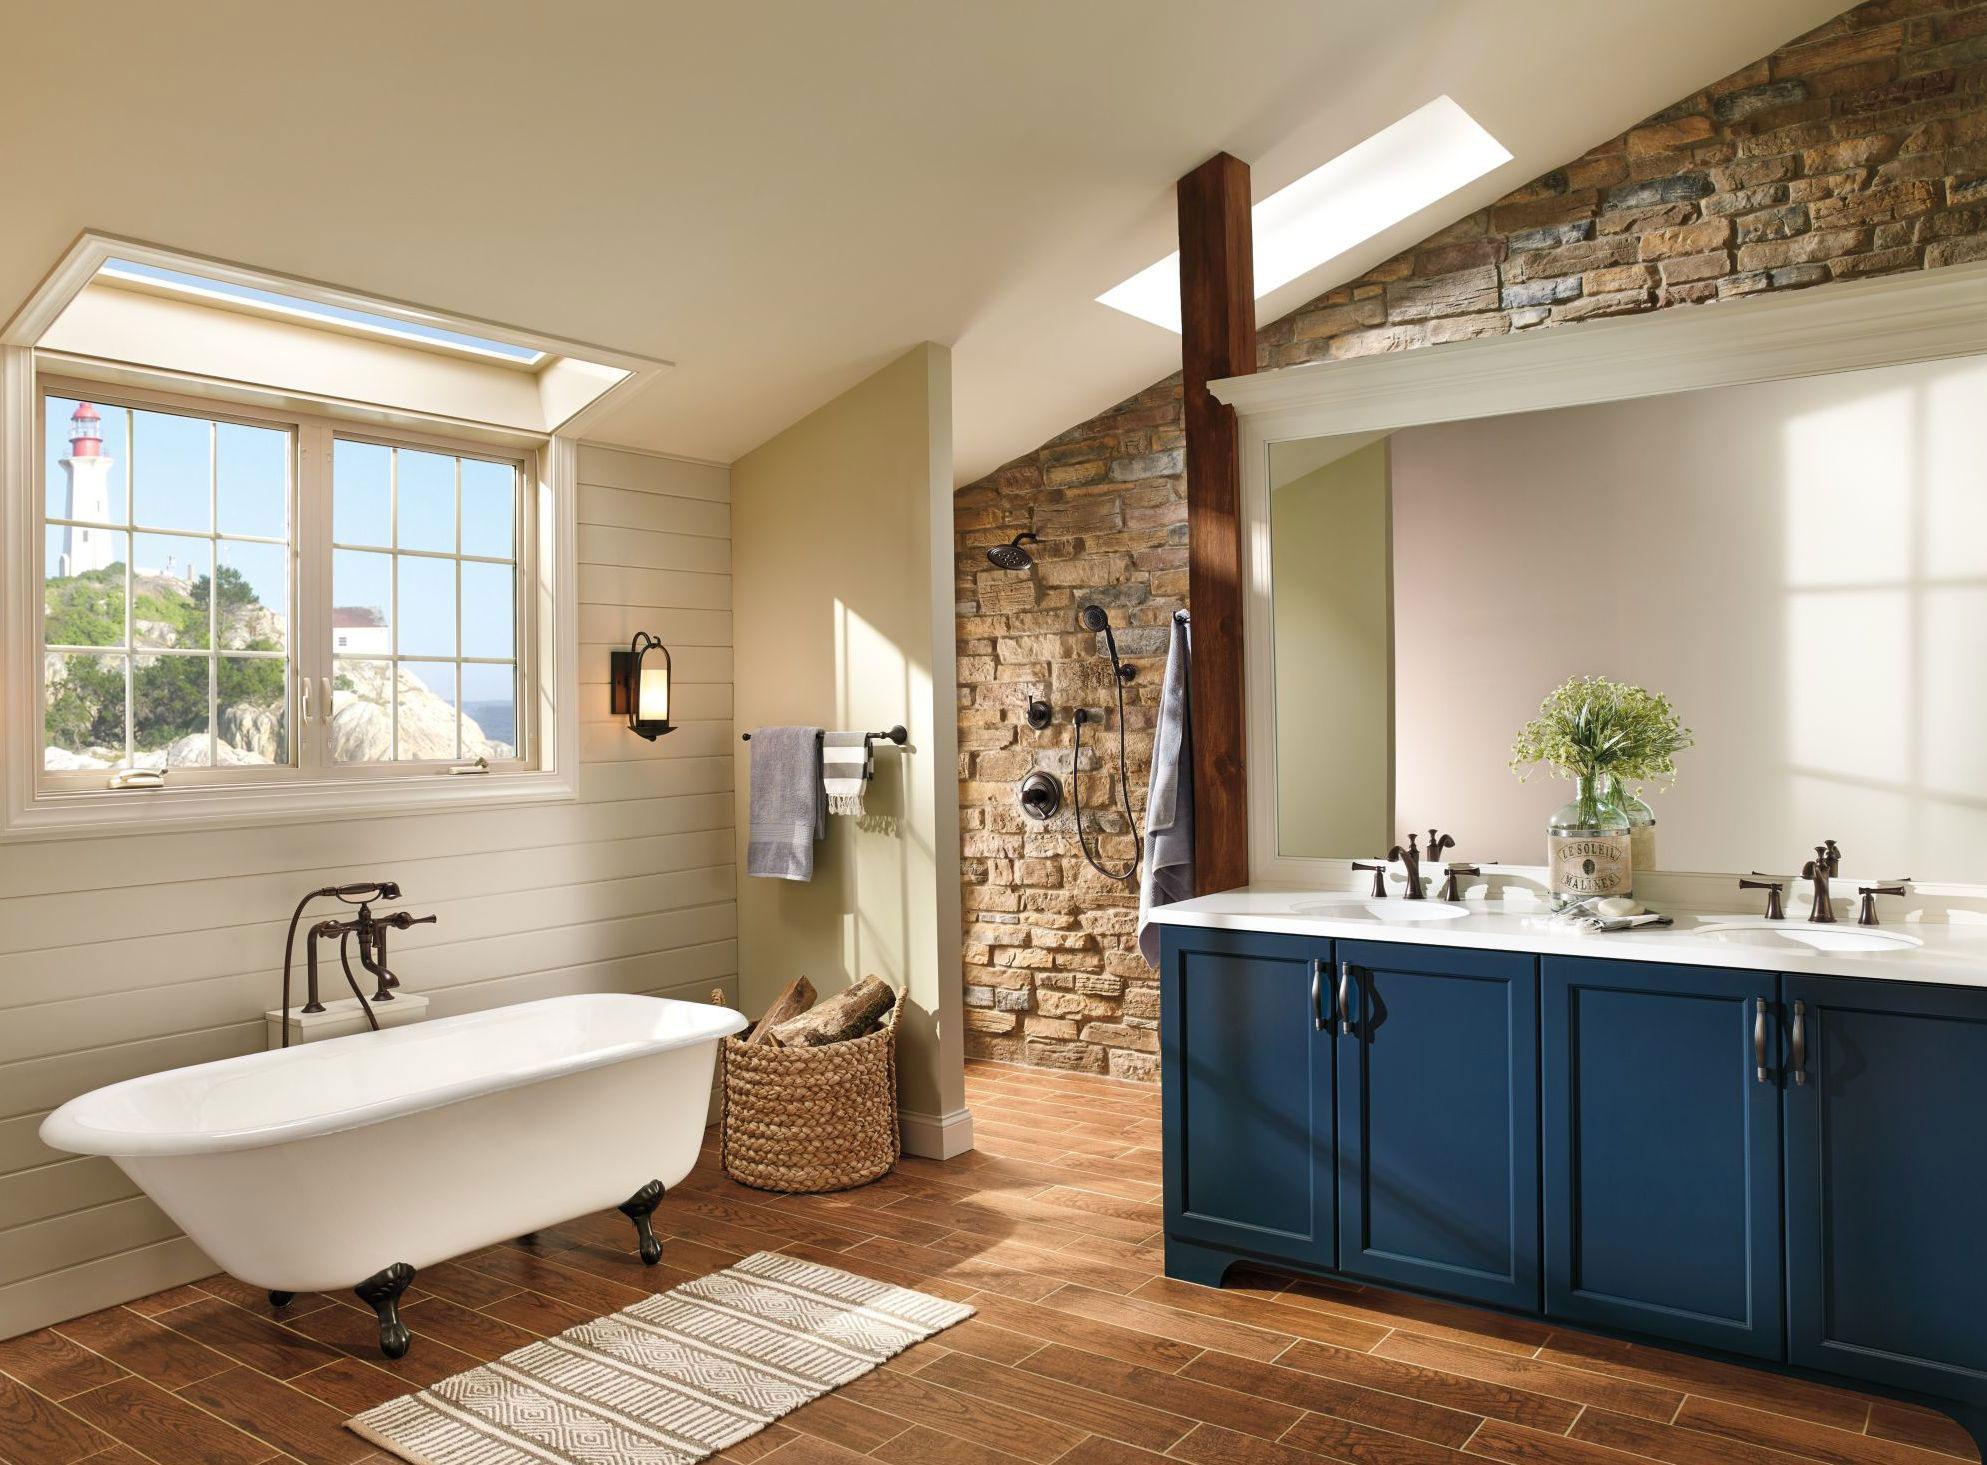 Bathroom Indoor Inspiration-2 Bathroom Indoor Inspiration you can't get enough of